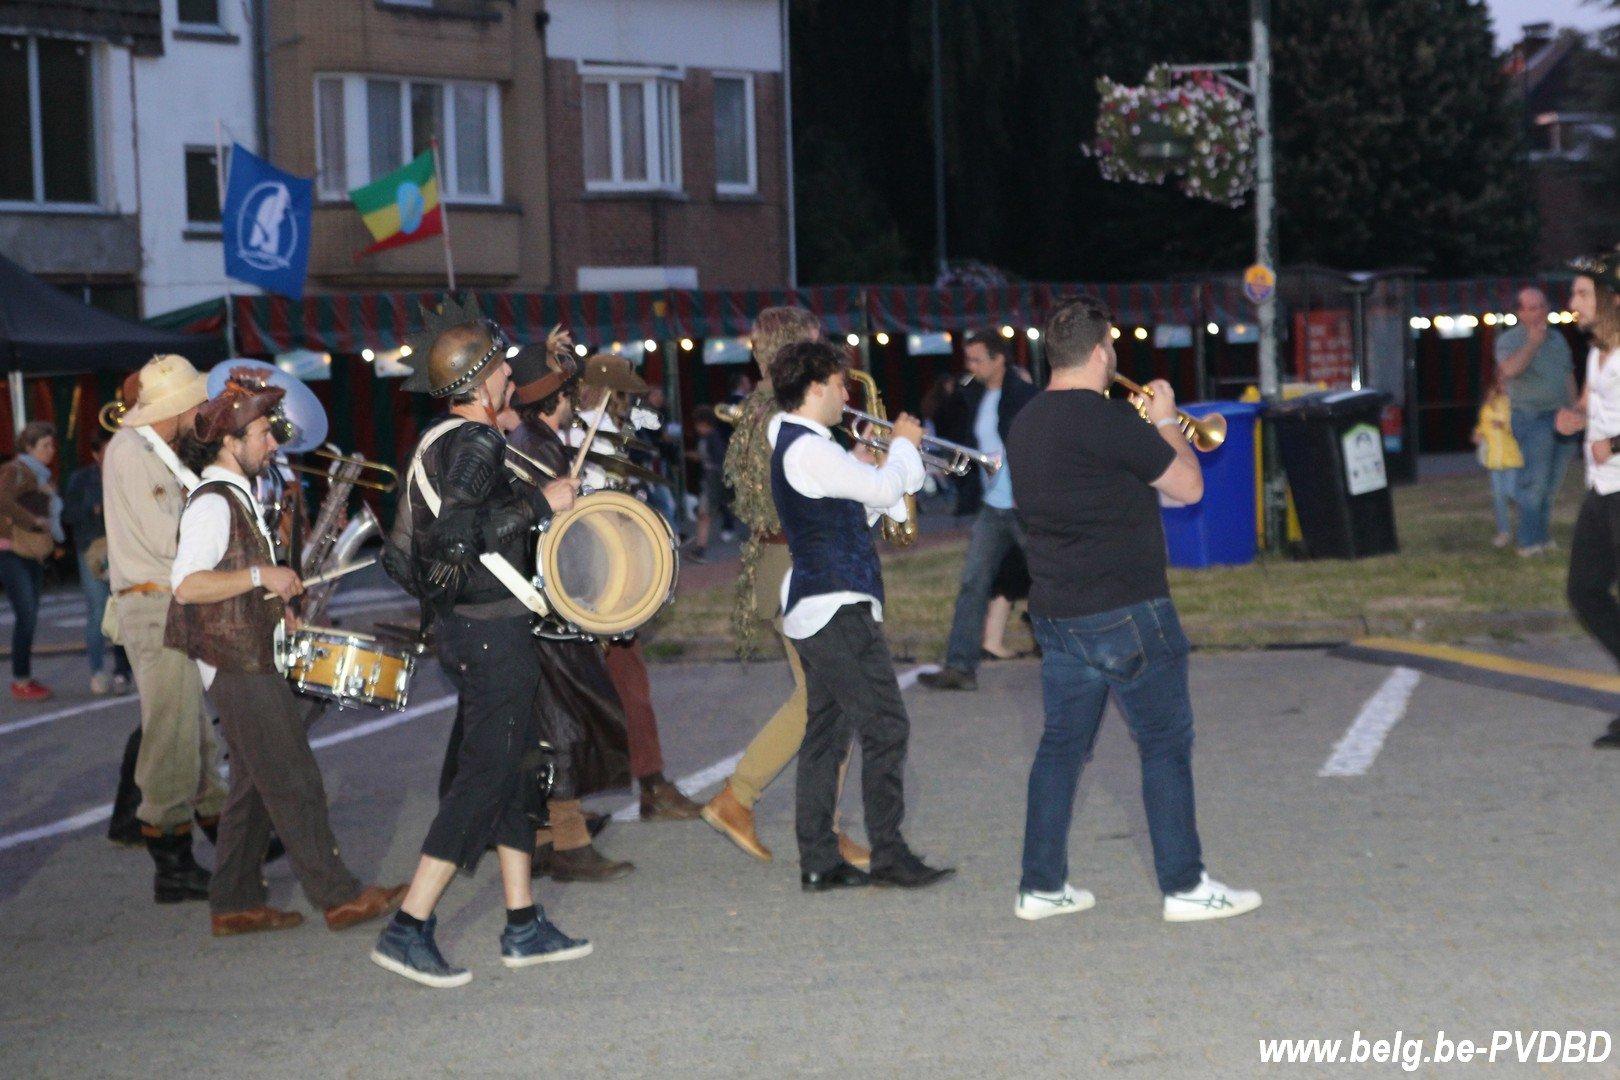 16e Vijverfestival Dilbeek groot succes - IMG 5586